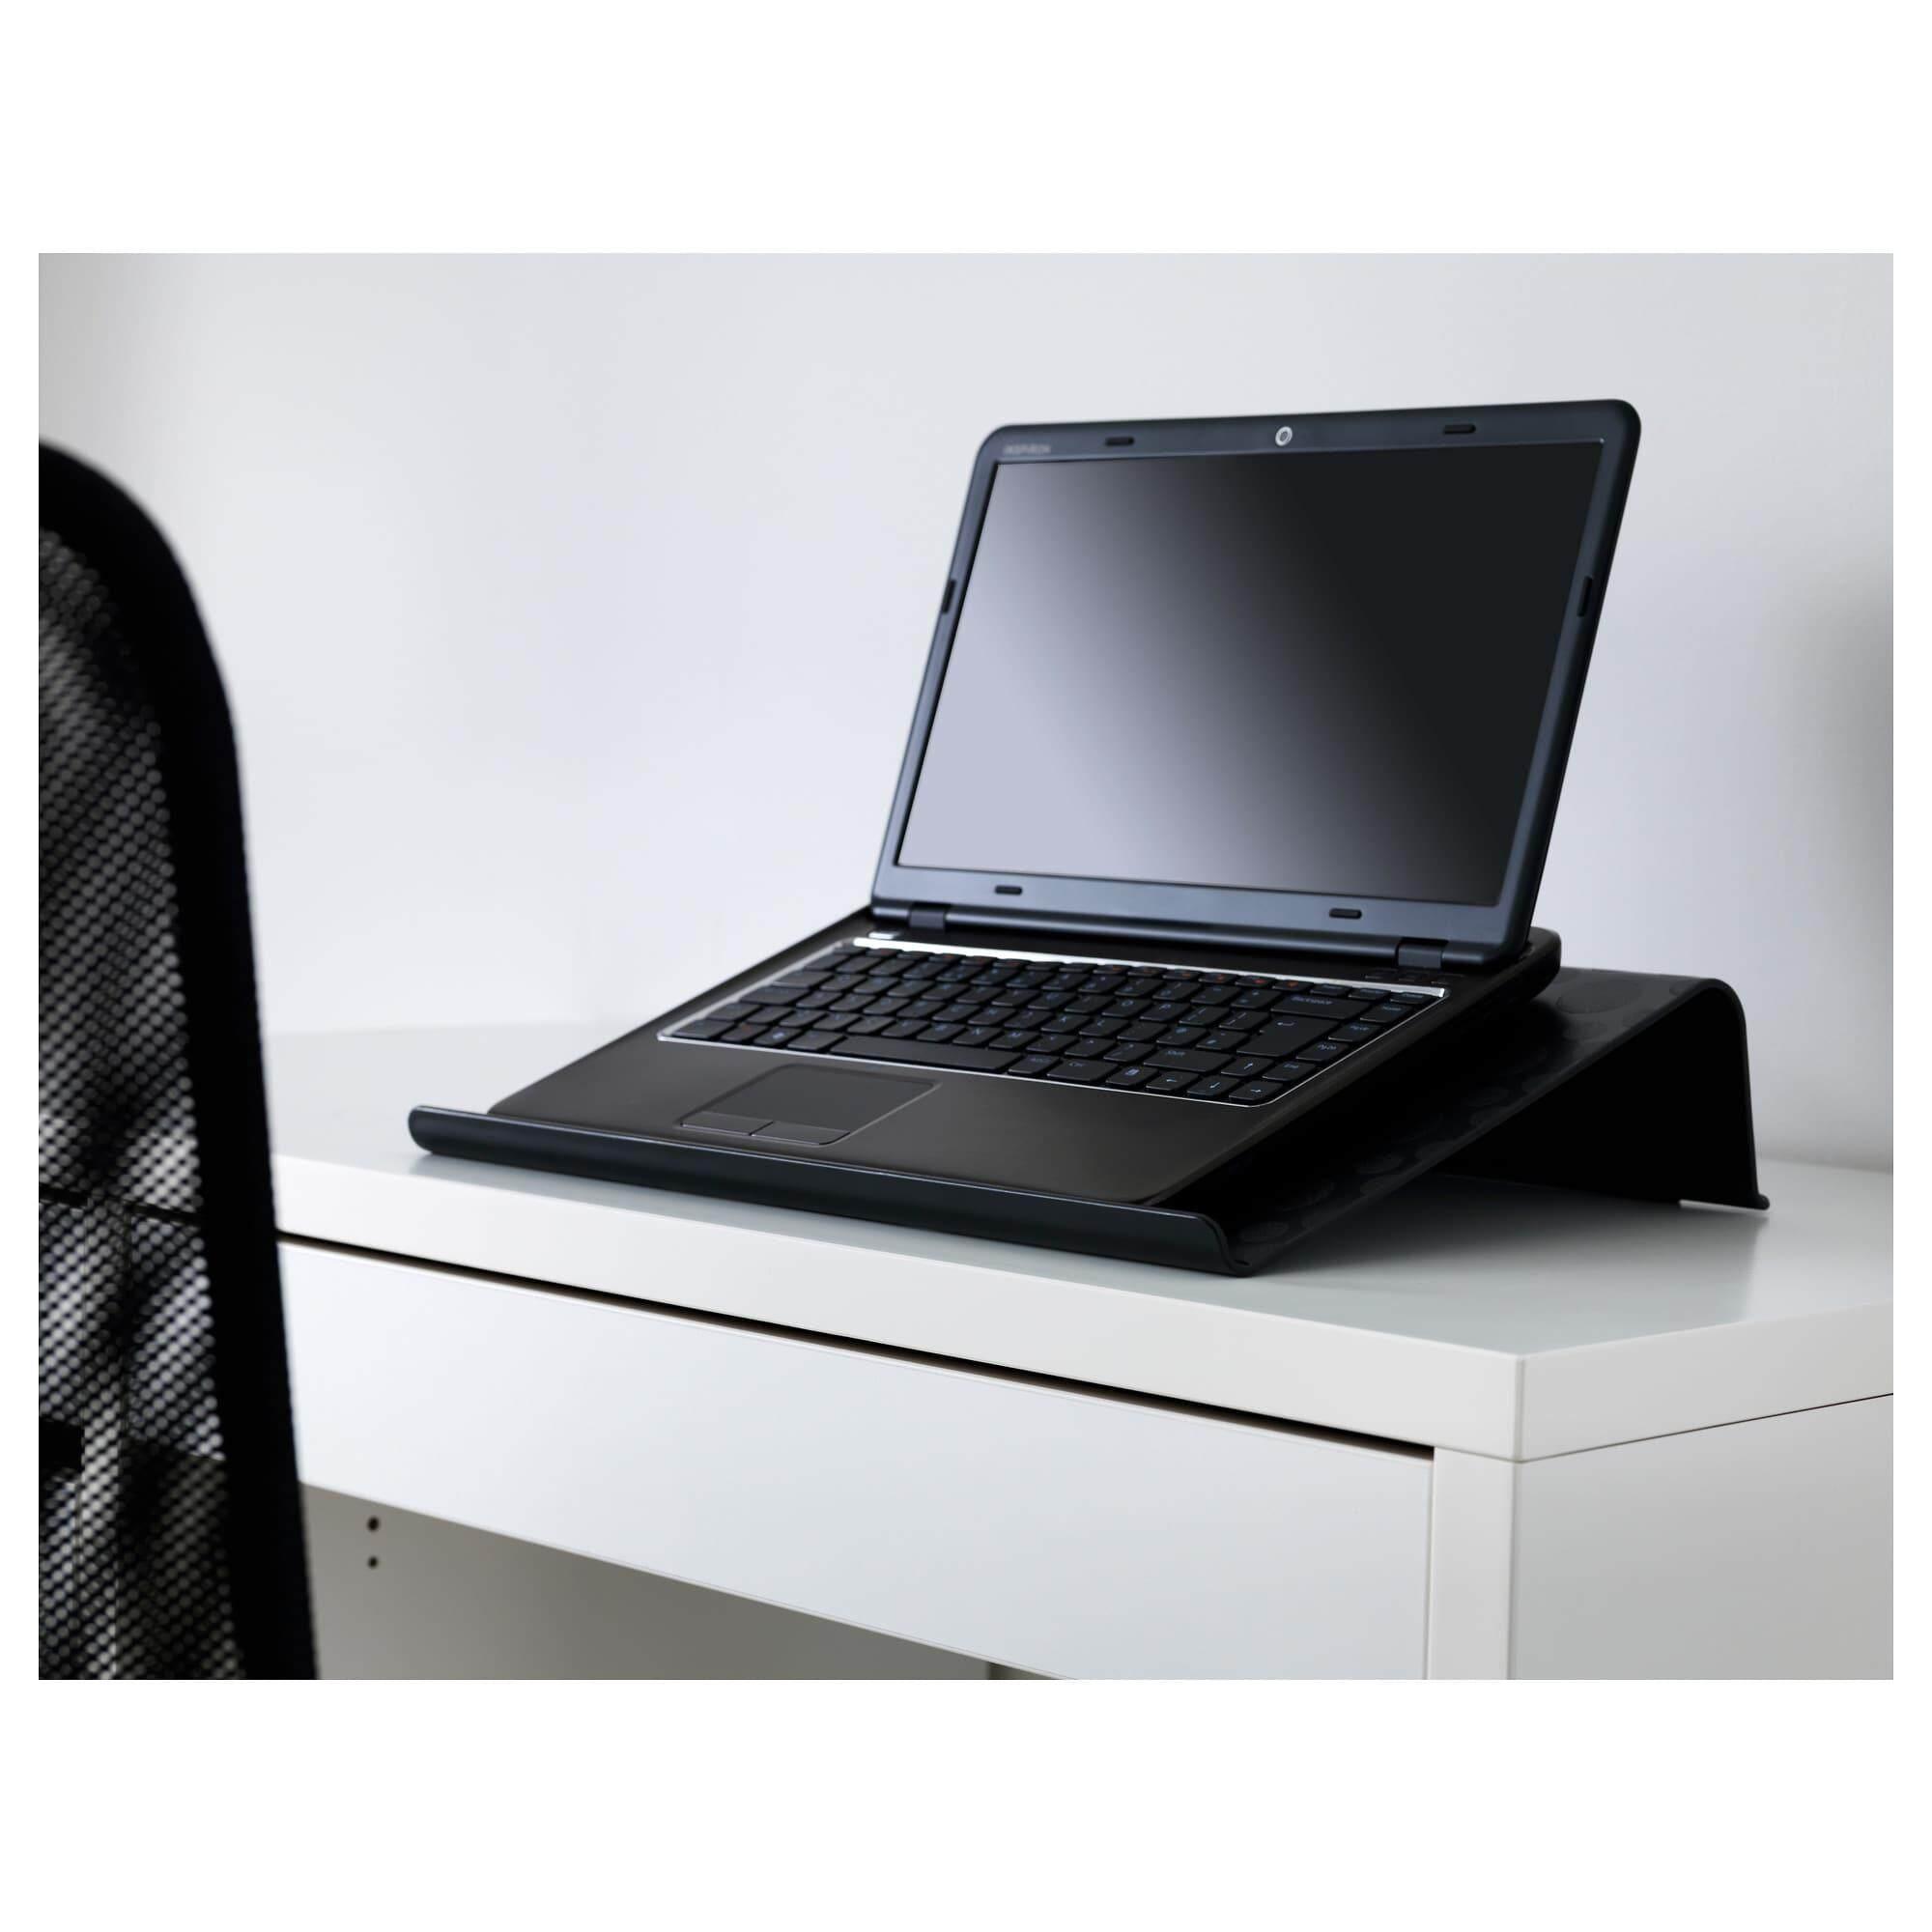 BrÄda แบรดด้า ที่วางแล็ปท็อป ดำ มียางกันลื่นช่วยยึดแล็ปท็อปไม่ให้เลื่อนไปมาขณะทำงานขอบตั้งป้องกันเครื่องแล็ปท็อปหล่น จึงวางเครื่องได้อย่างปลอดภัยท็อปโต๊ะเอียง หน้าจอแล็ปท็อปตรงกับระดับสายตาพอดี จาก Ikea.